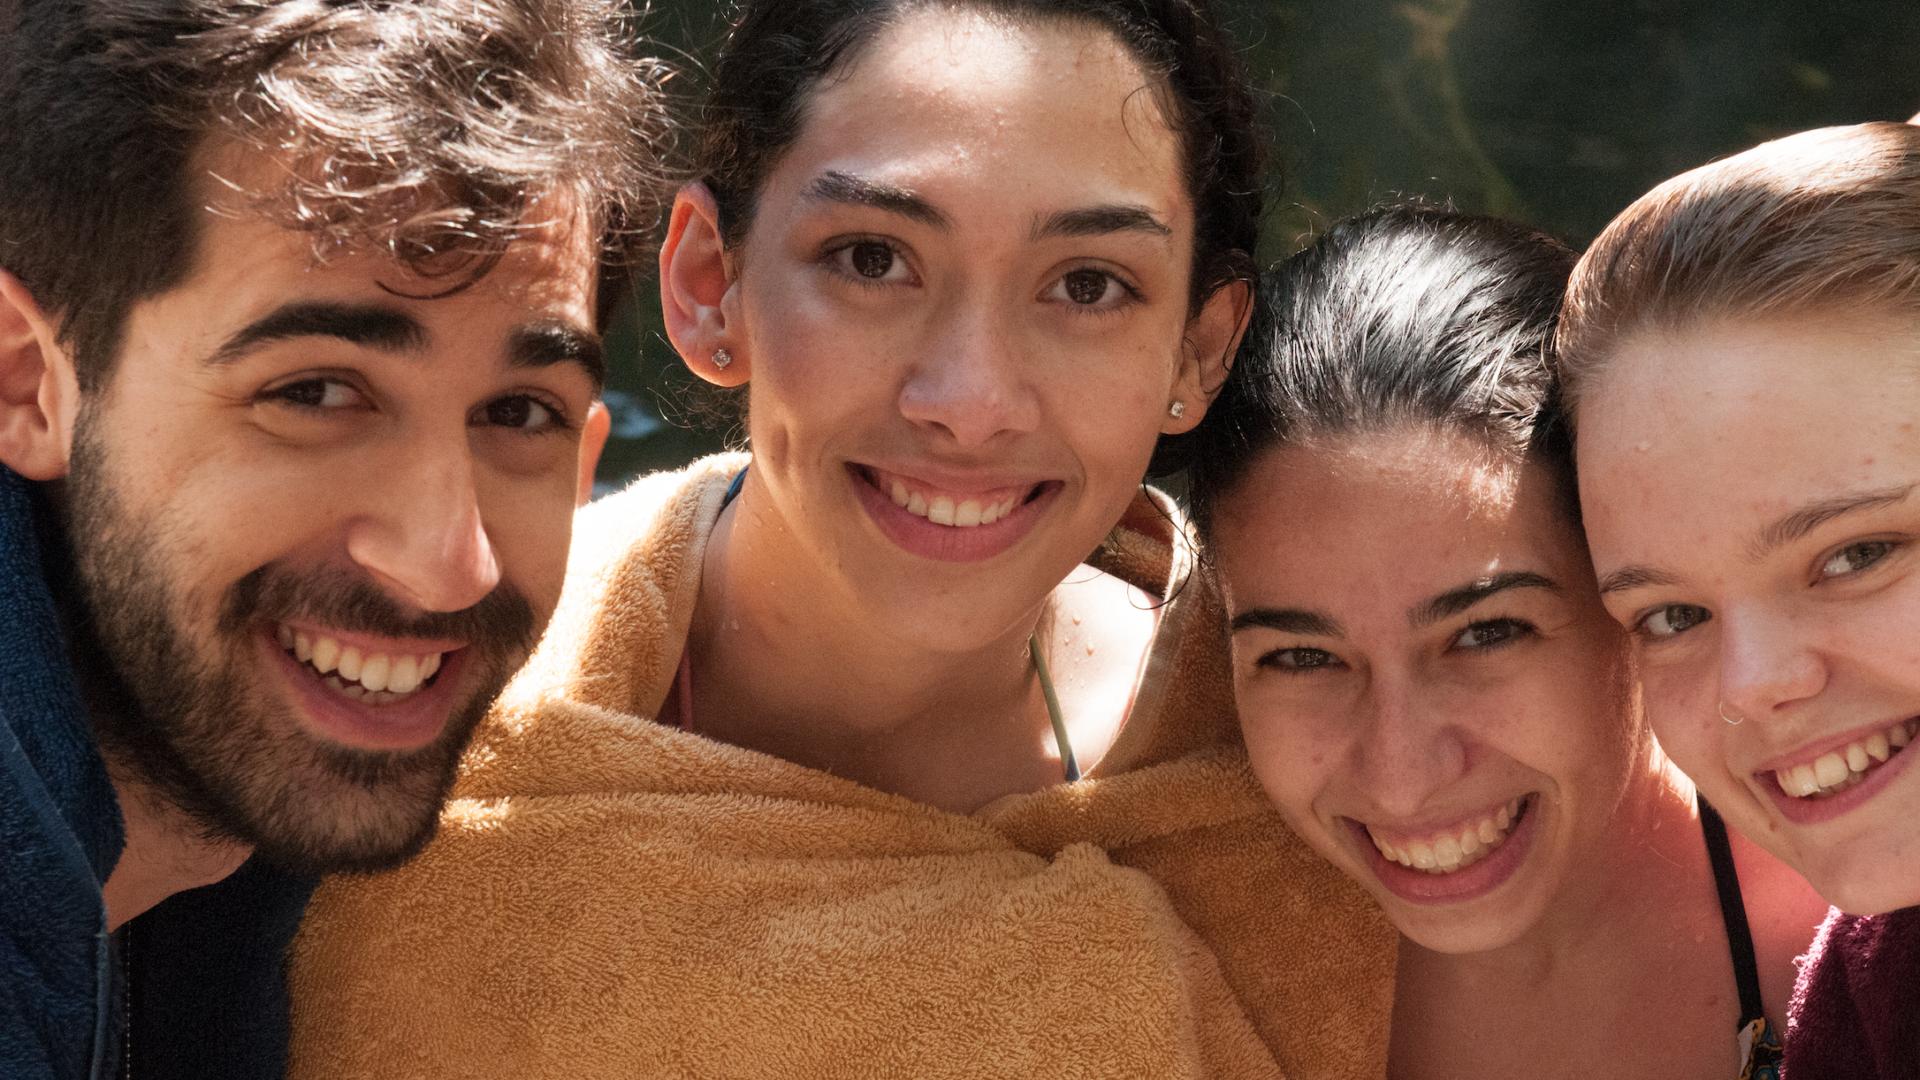 Supported Opportunities: Evyatar Cohen, Leanne Gonzalez, Zahava Hirsch, Anna McPherran in Cuba, 2016